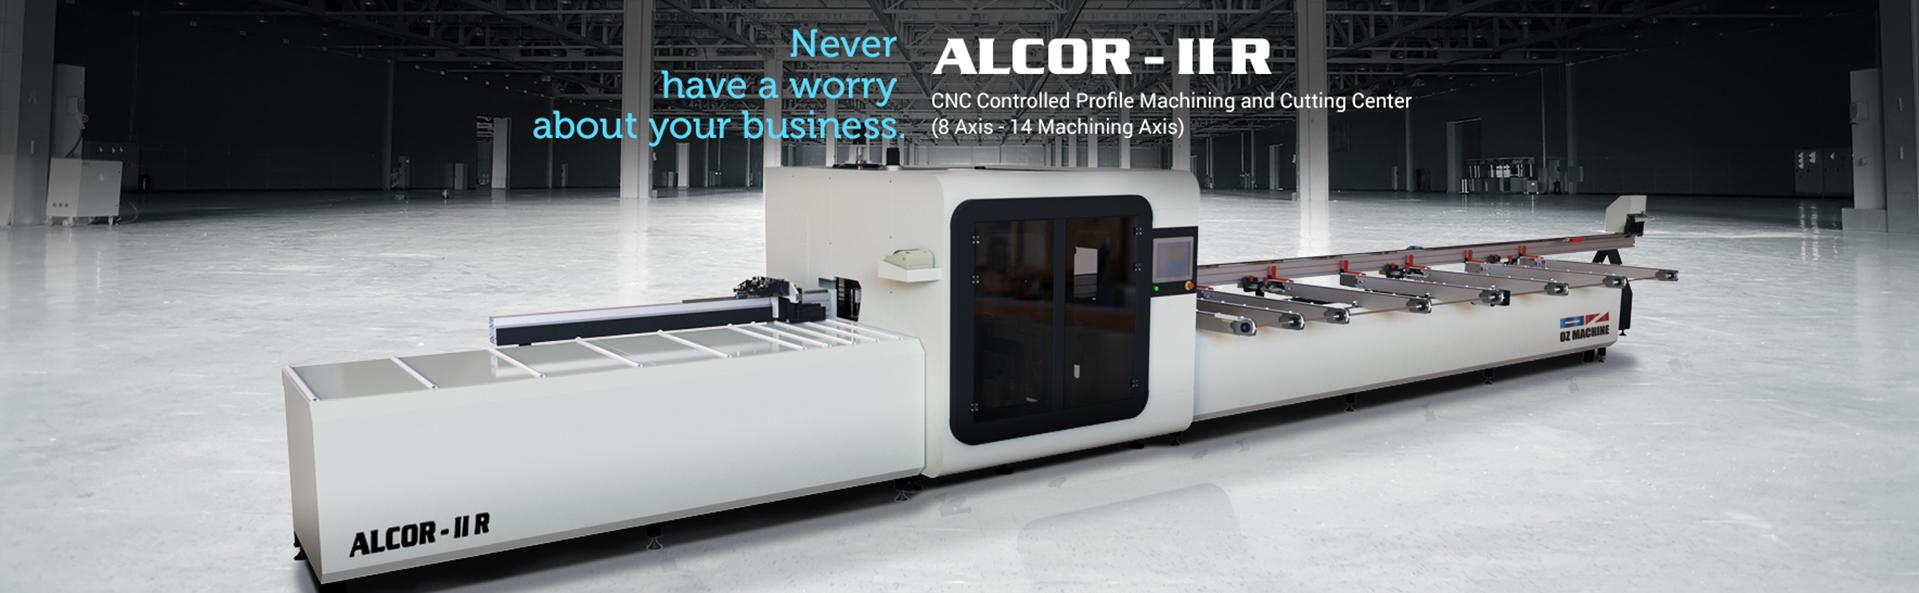 http://awdi.nyc/manufacturing-equipment